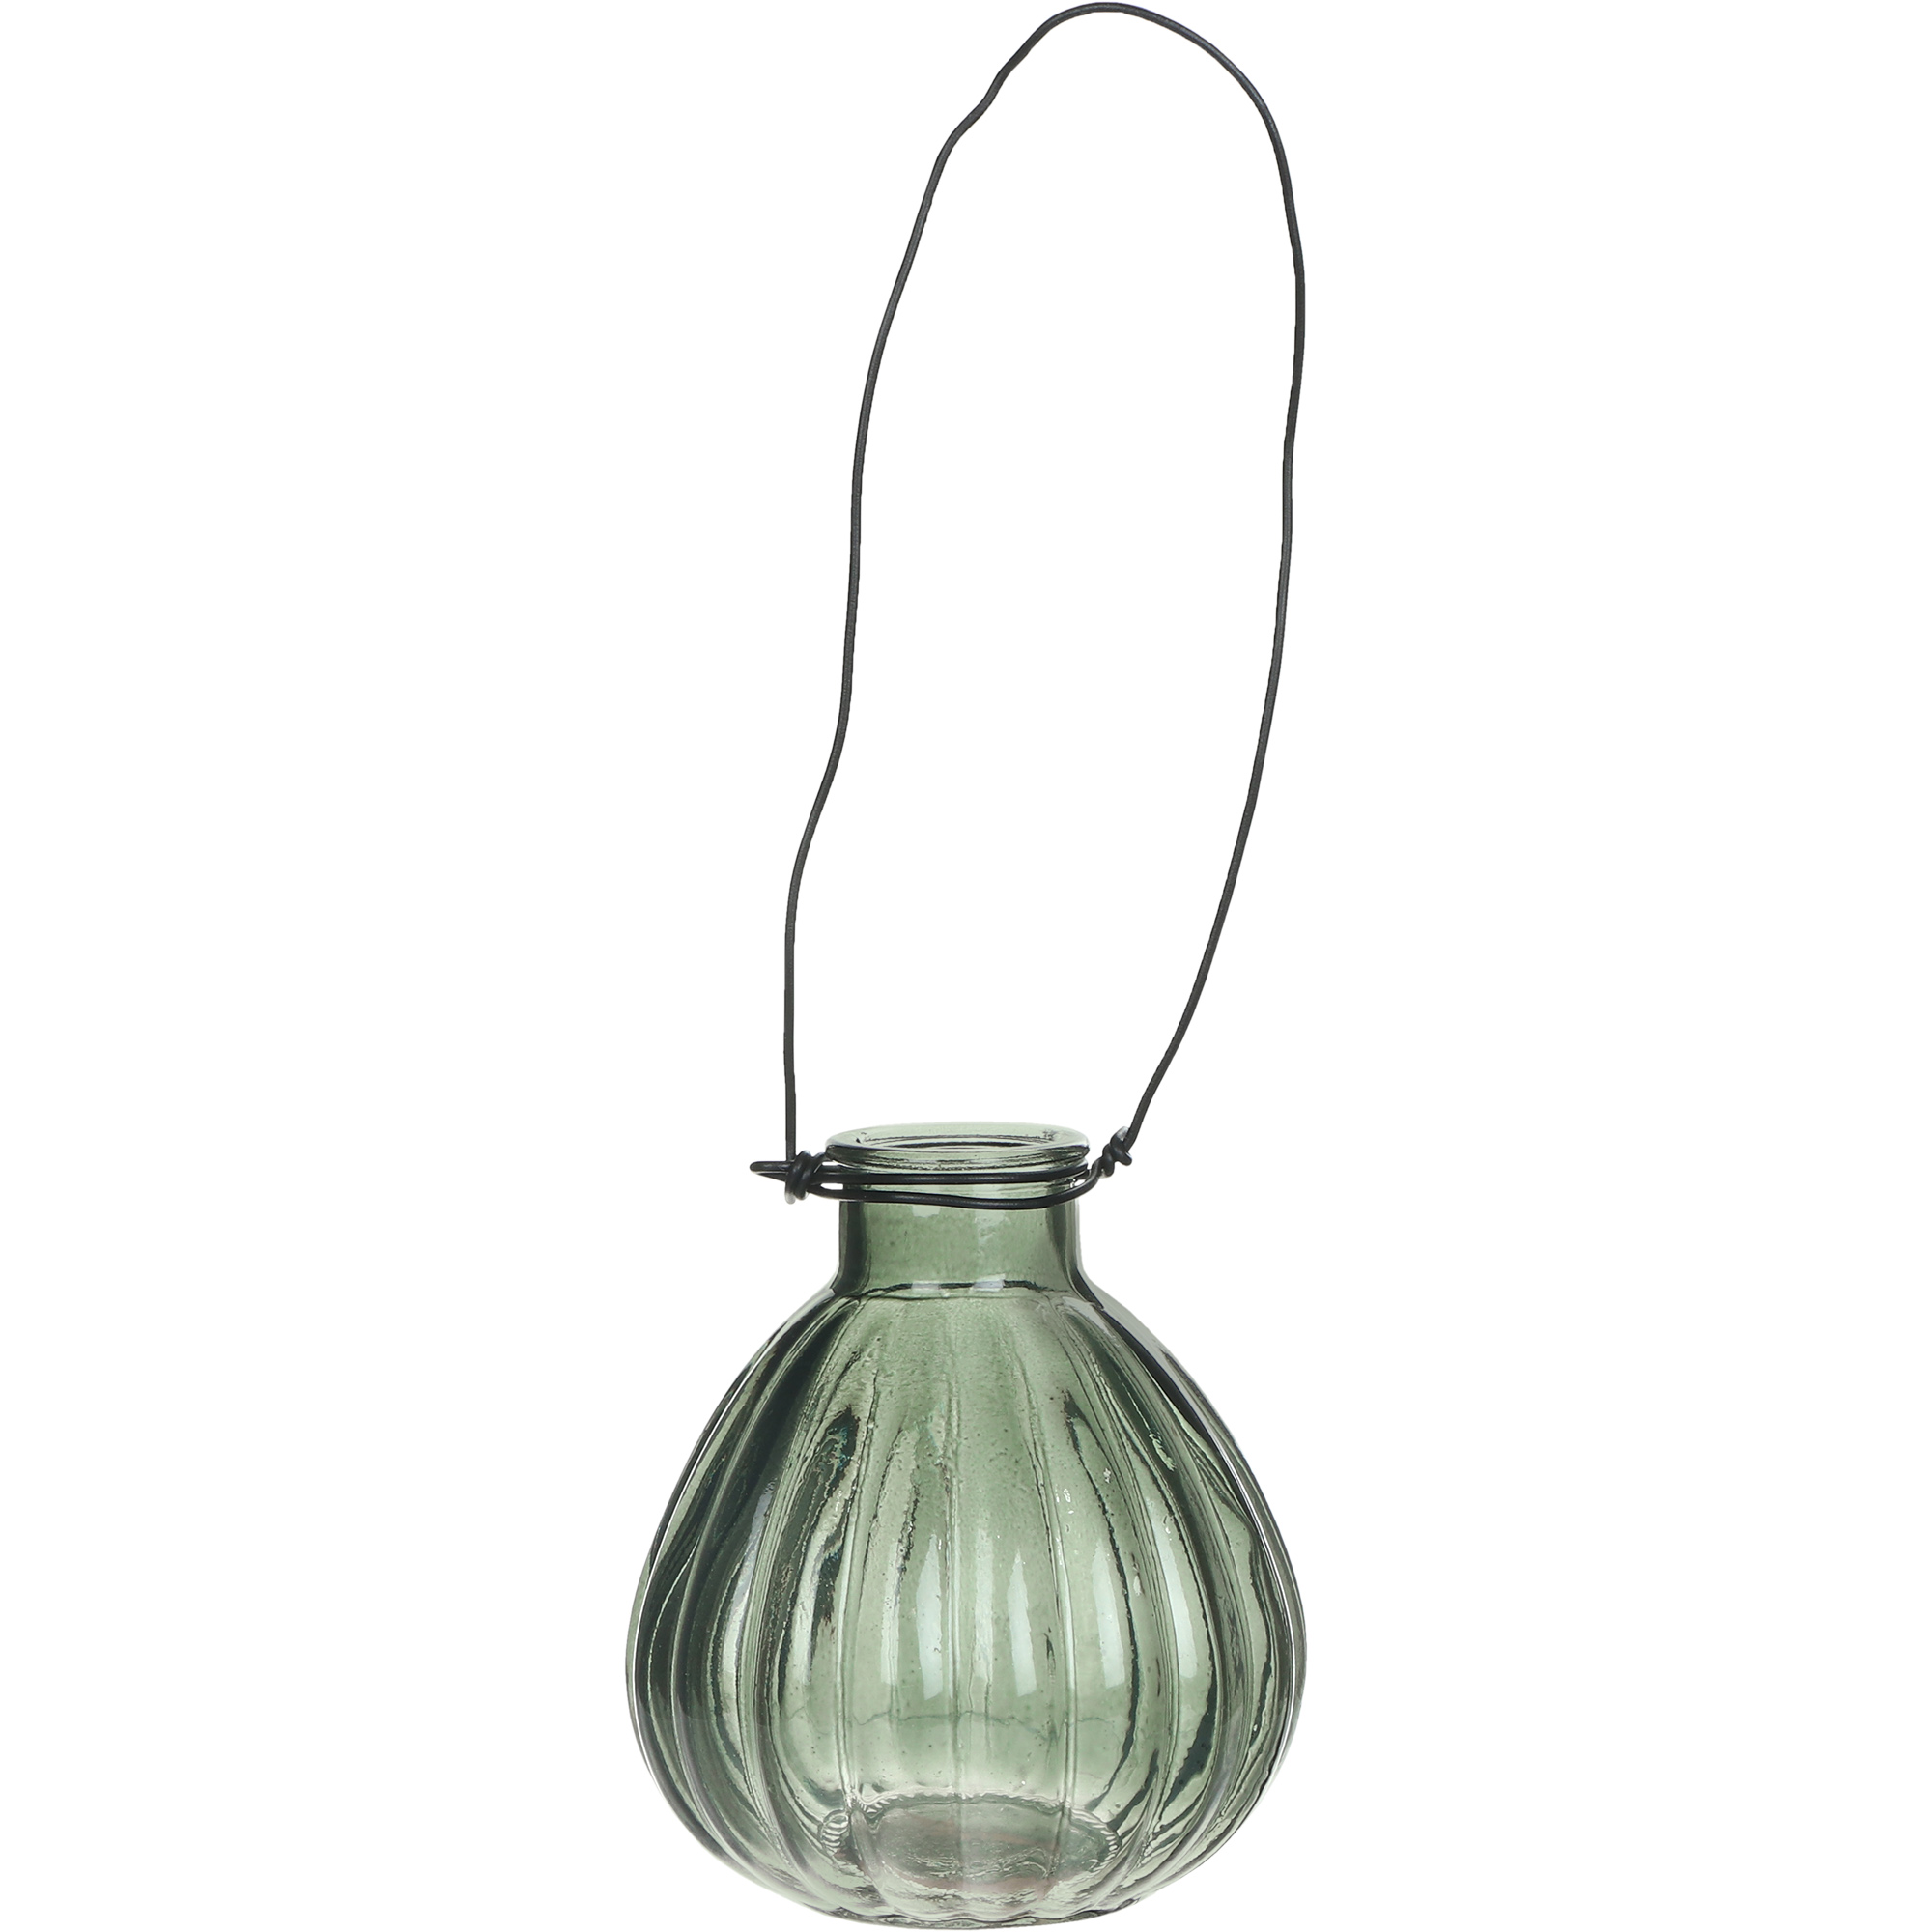 Ваза Hakbijl glass Mini Vase серая 8,5х11 см